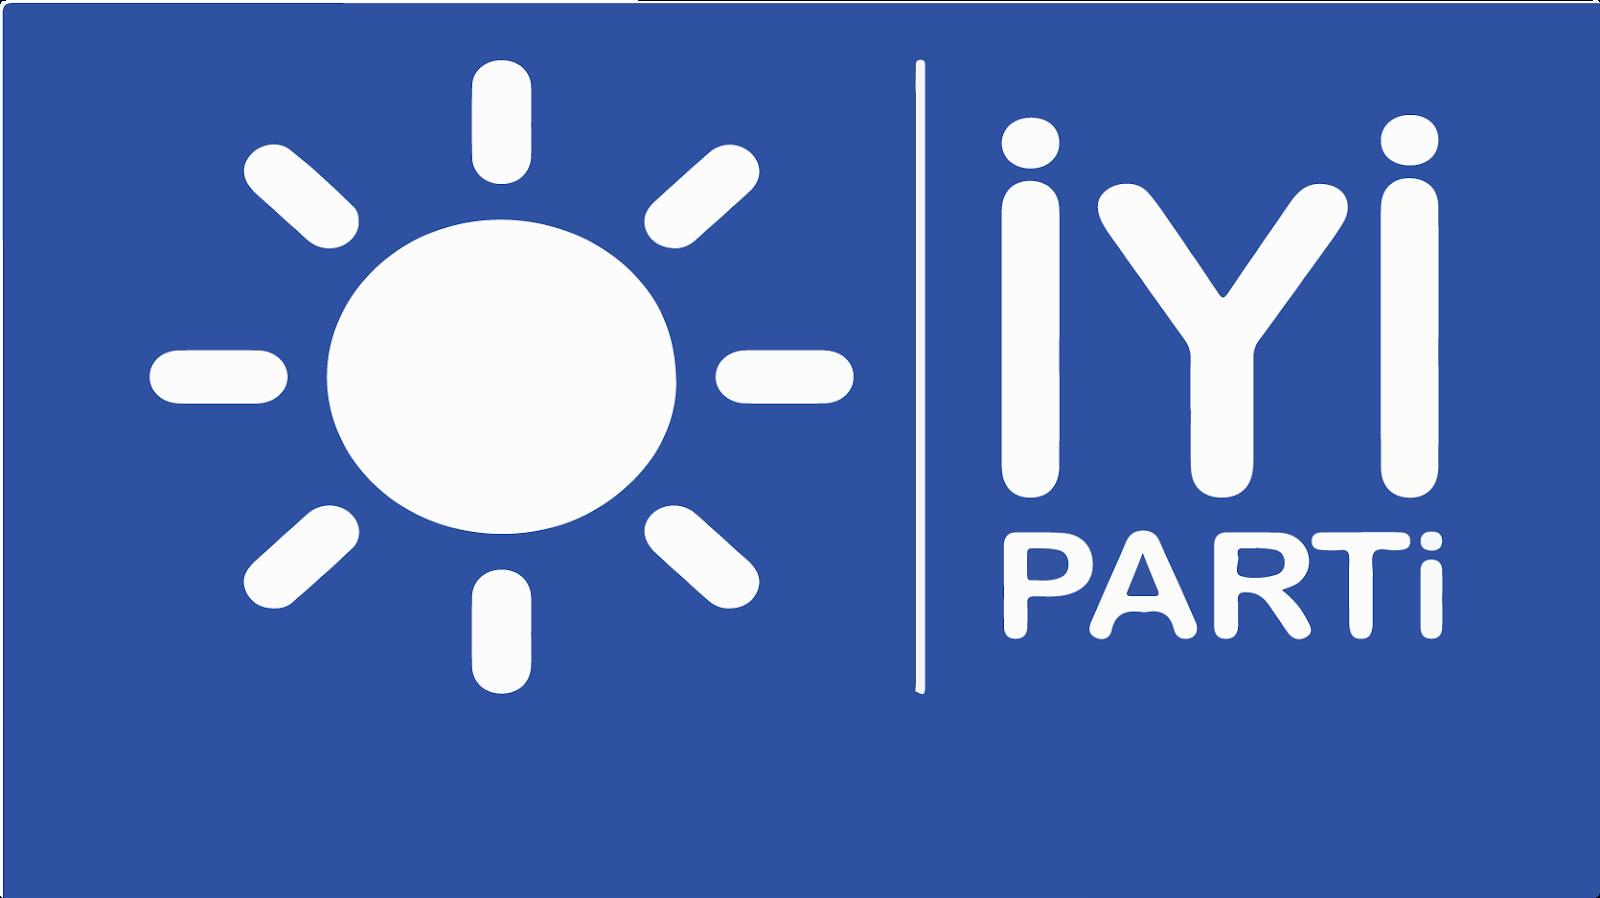 İyi Parti Logo Vektör Çizim